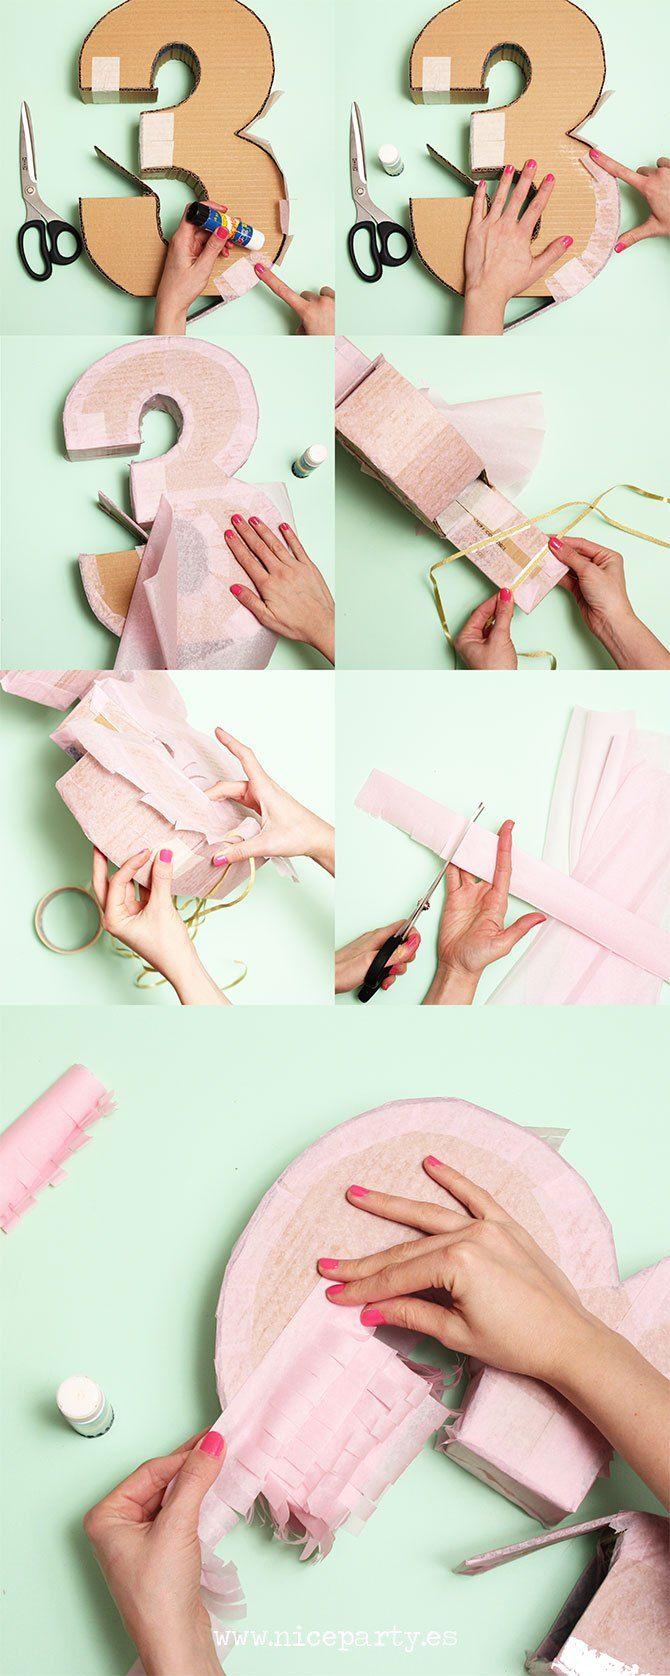 How to make a piñata step by step